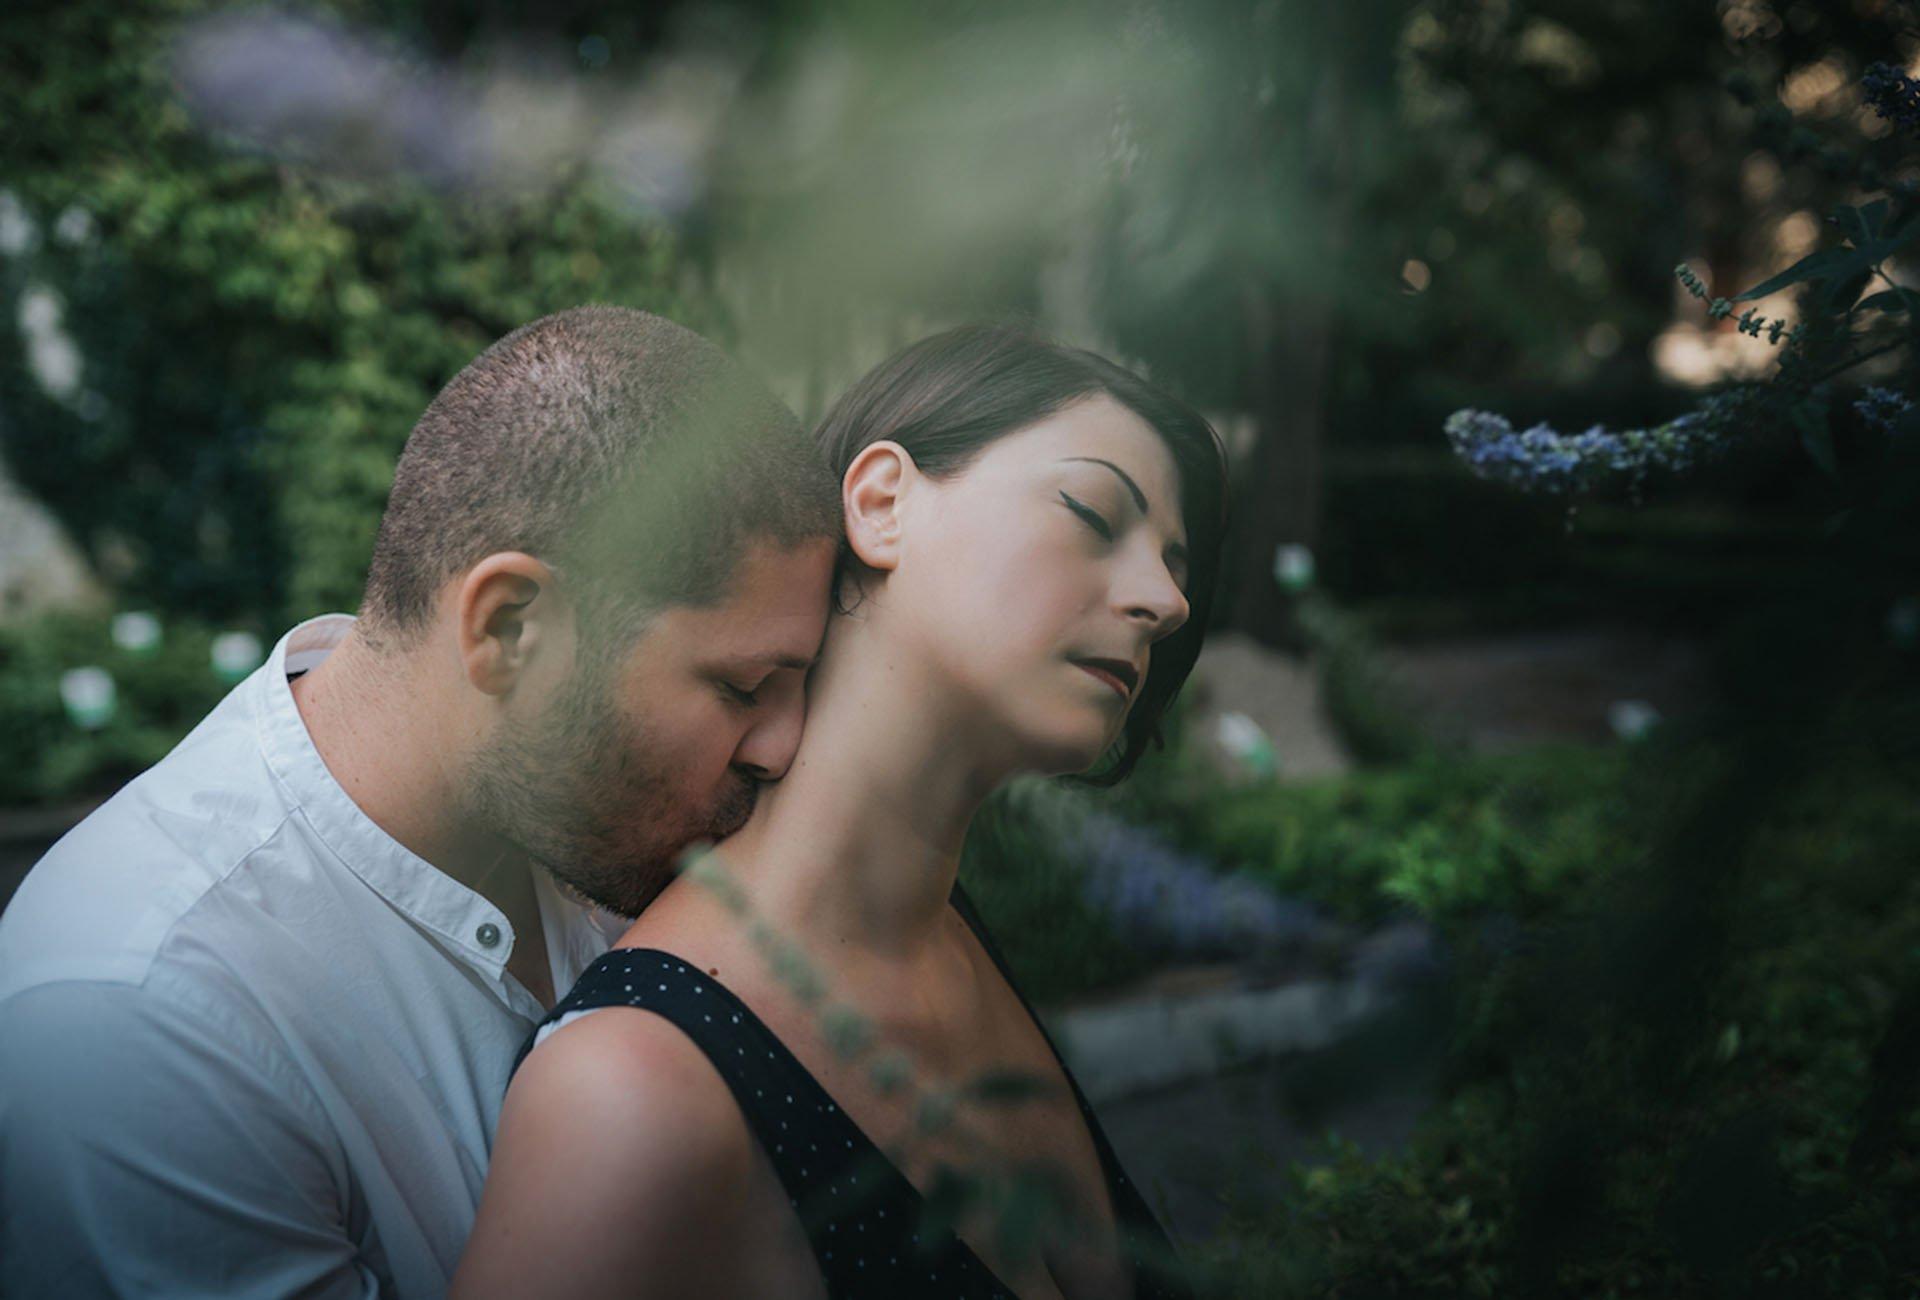 Anteprima-Matrimonio-Salerno-9